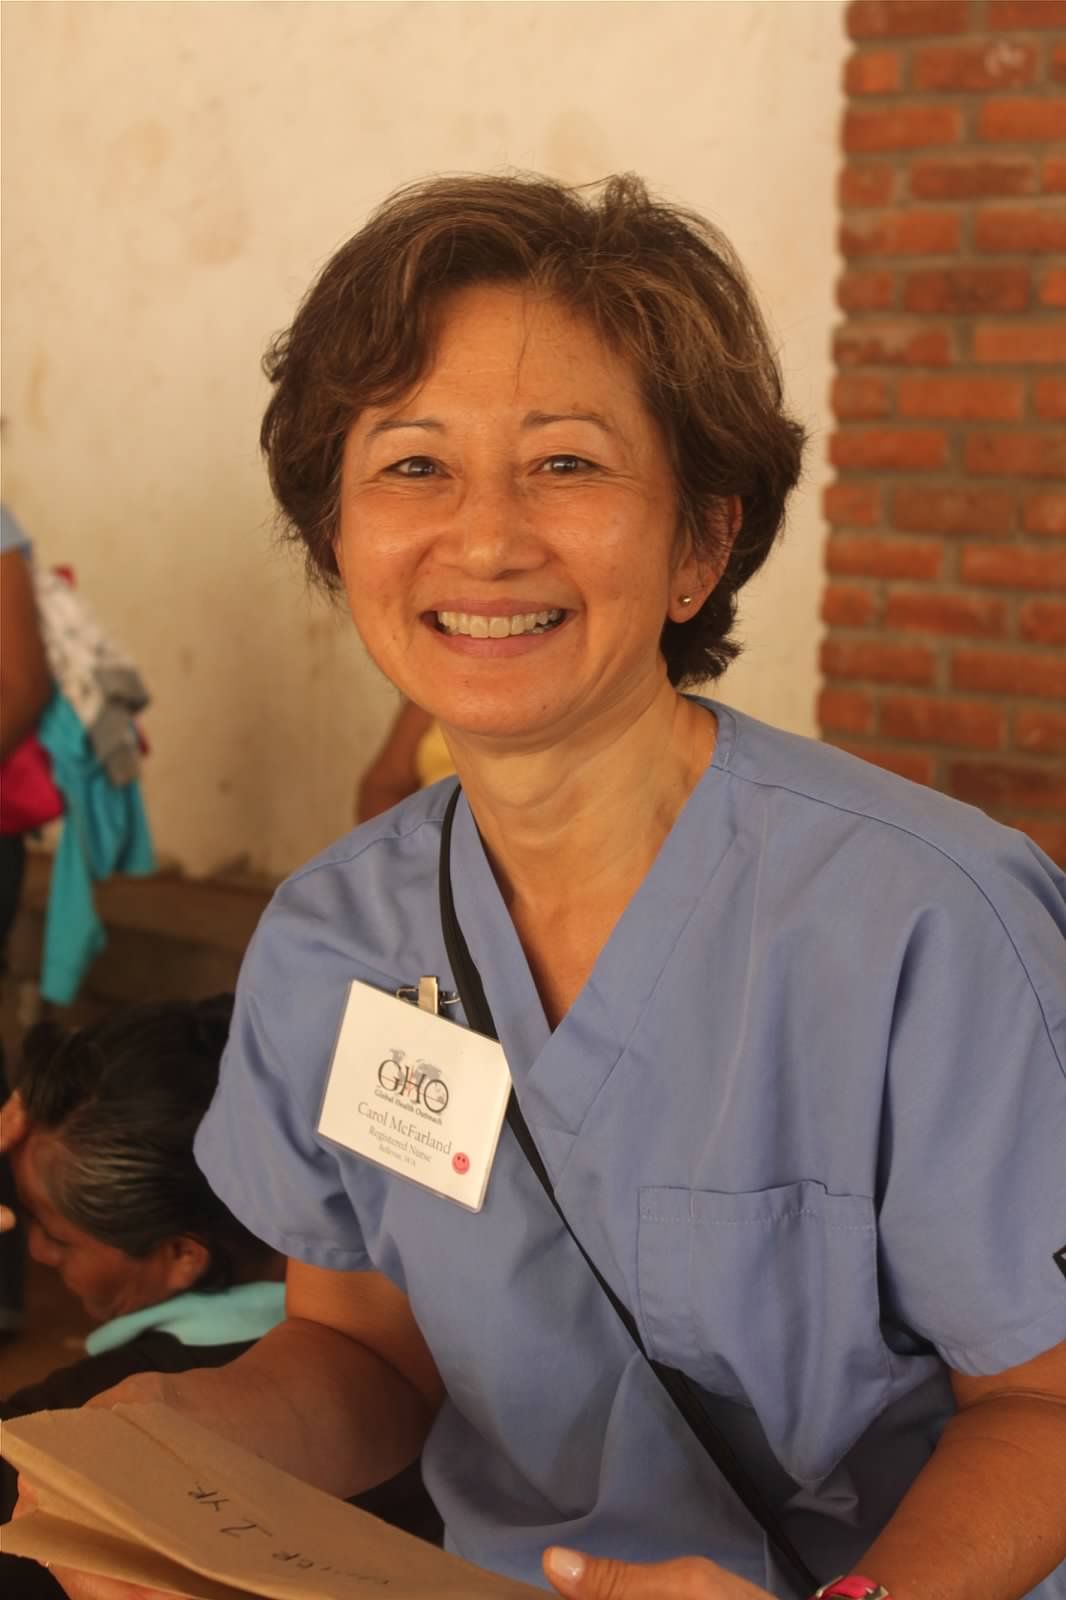 GHO Medical Team 2013